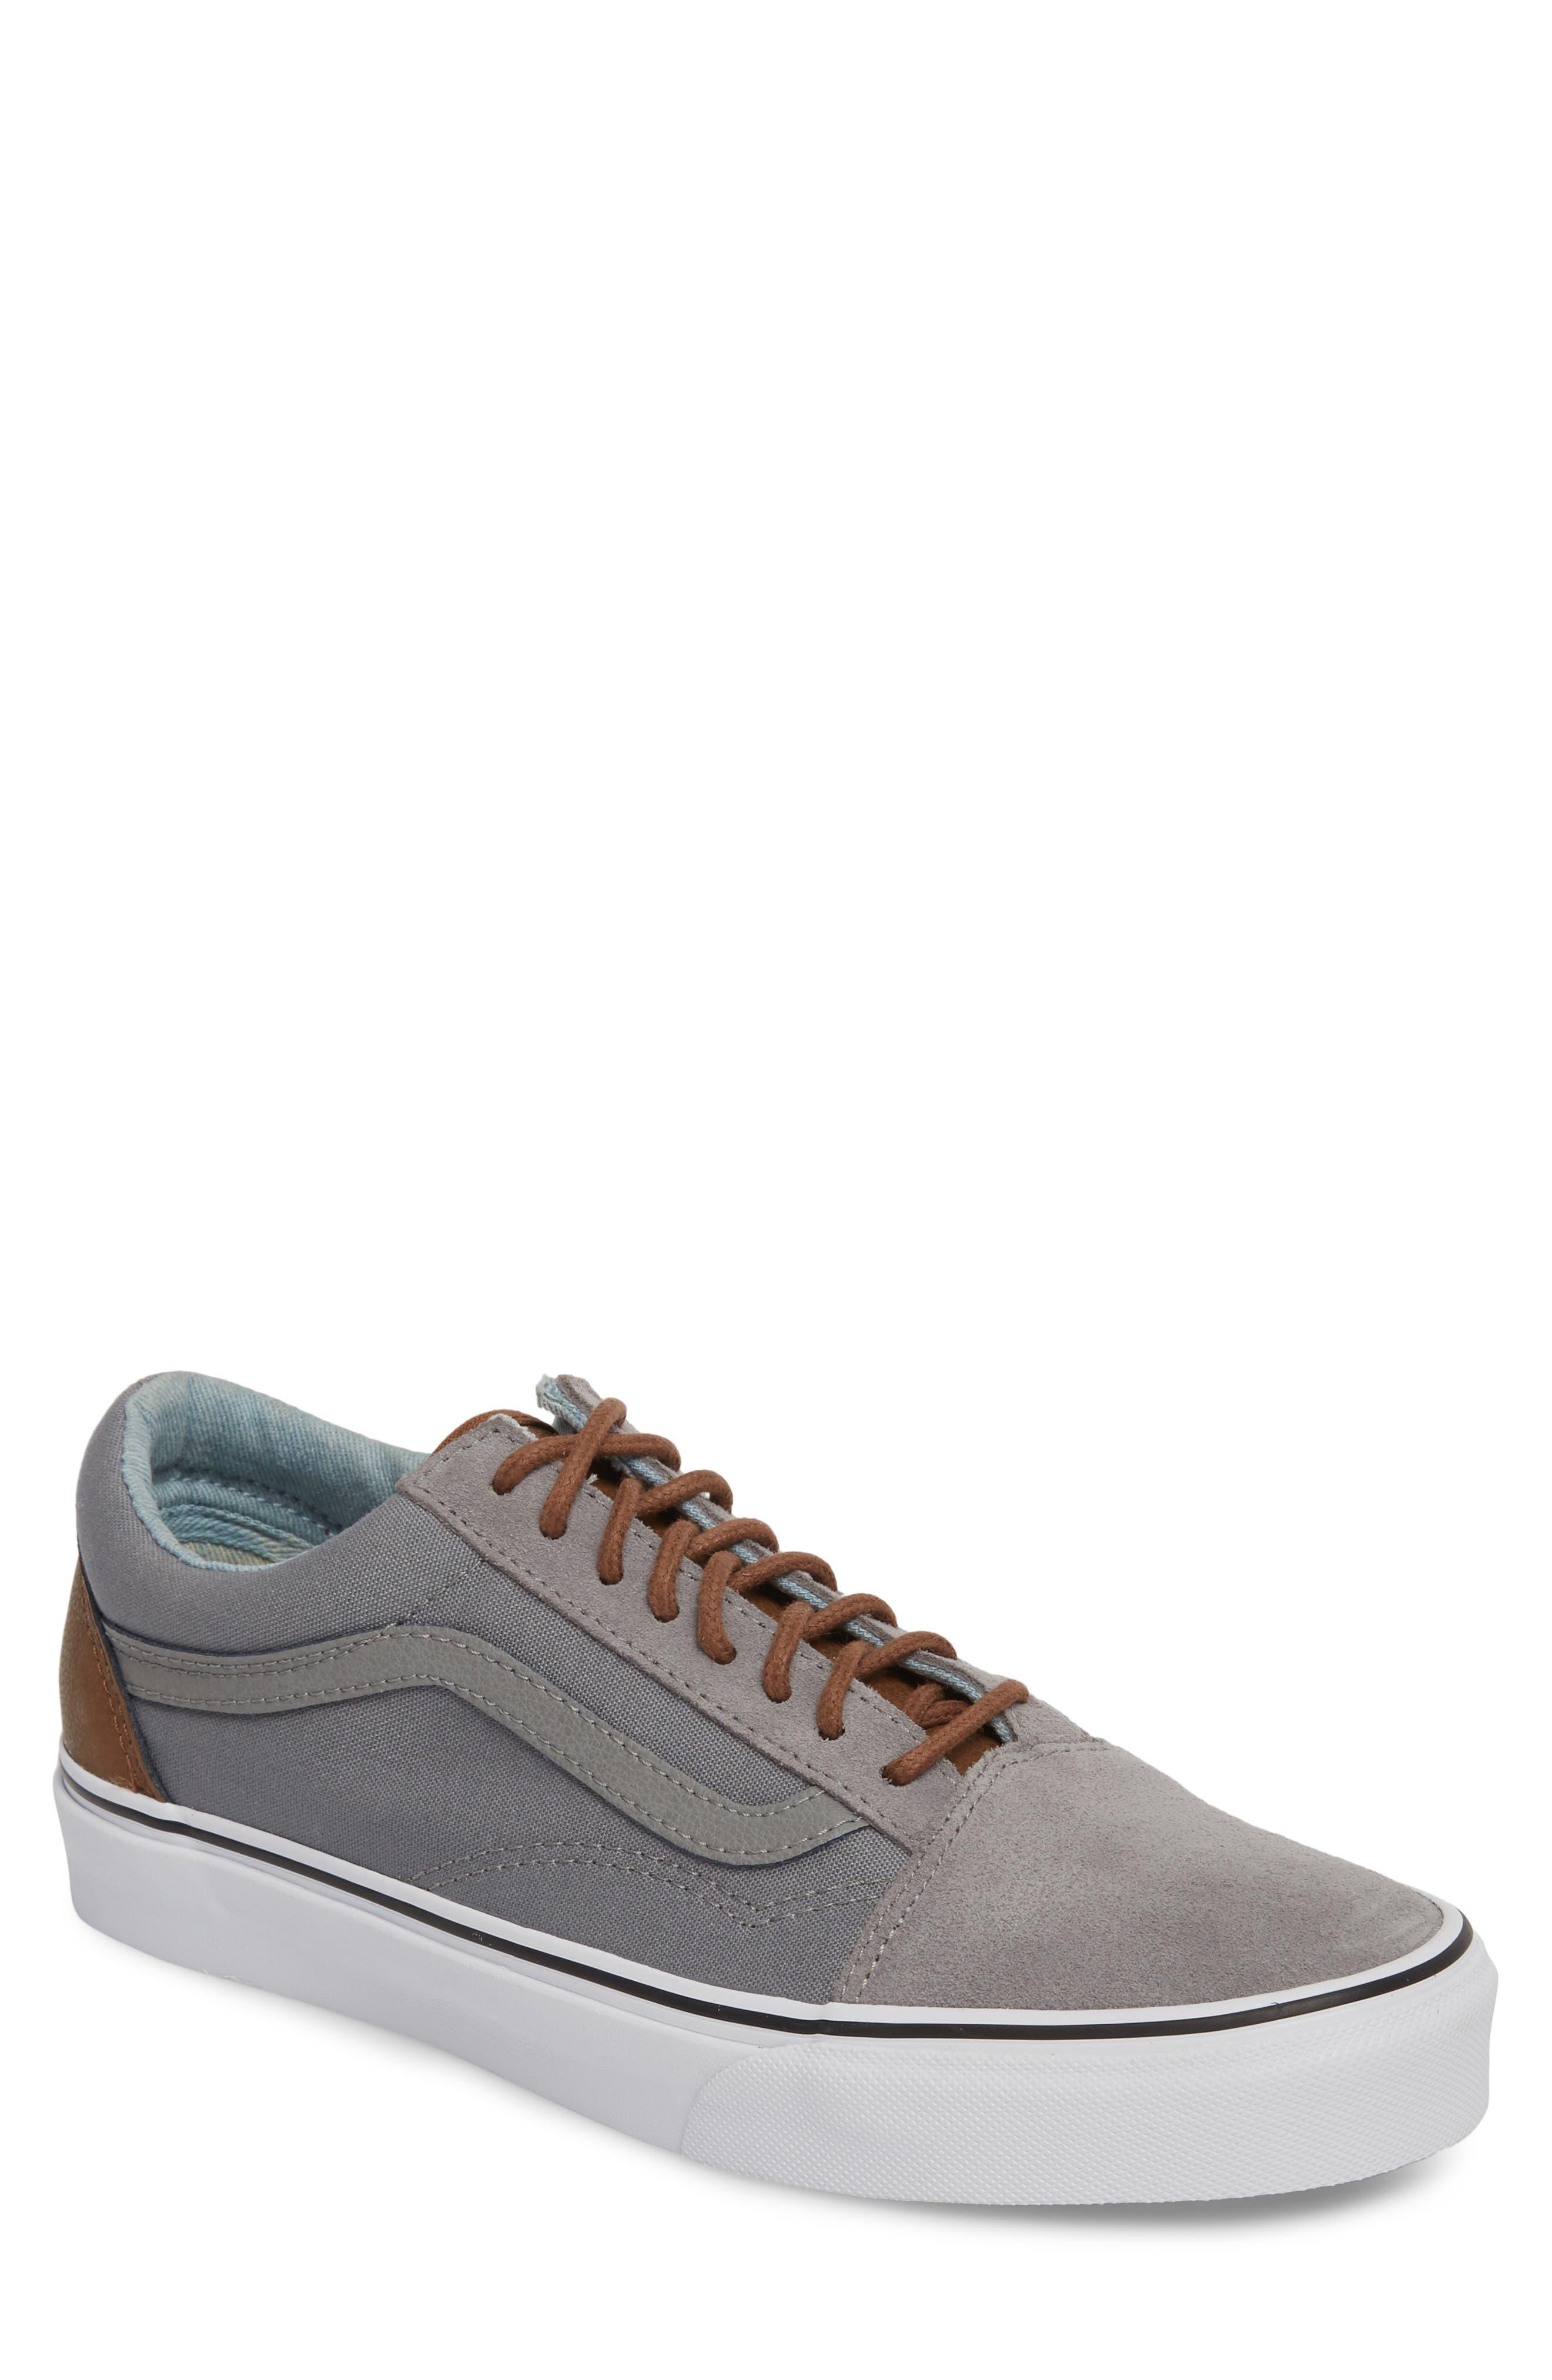 Old Skool Low Top Sneaker,                         Main,                         color, Frost Grey/ Acid Denim Leather